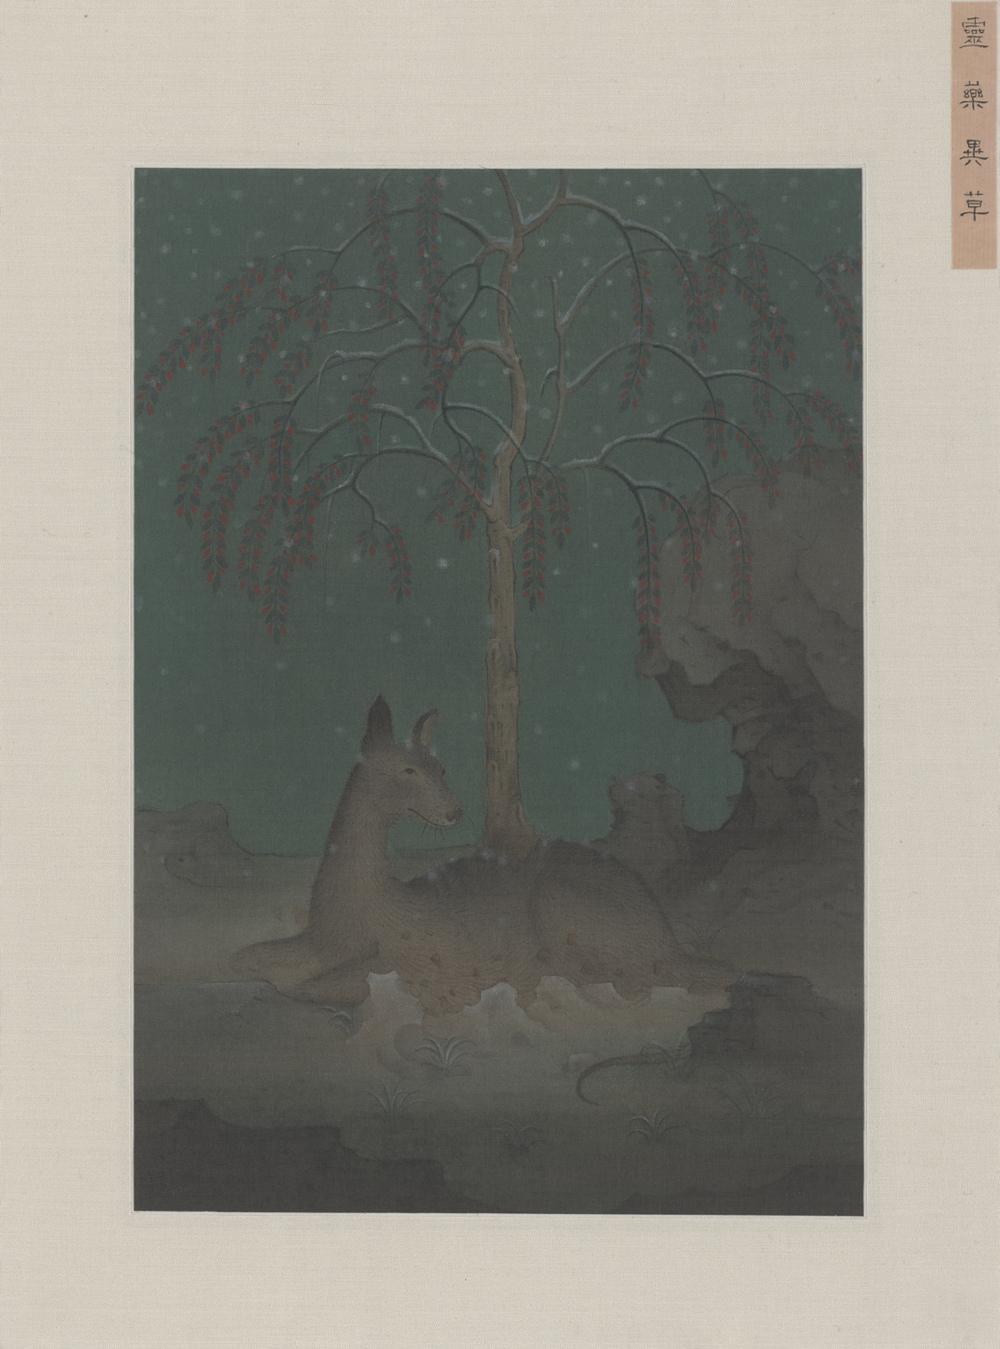 Hao Liang 郝量, Magical Herbs 灵药异草, 2013, Ink and color on silk 绢本重彩, 27.5 x 19.5 cm